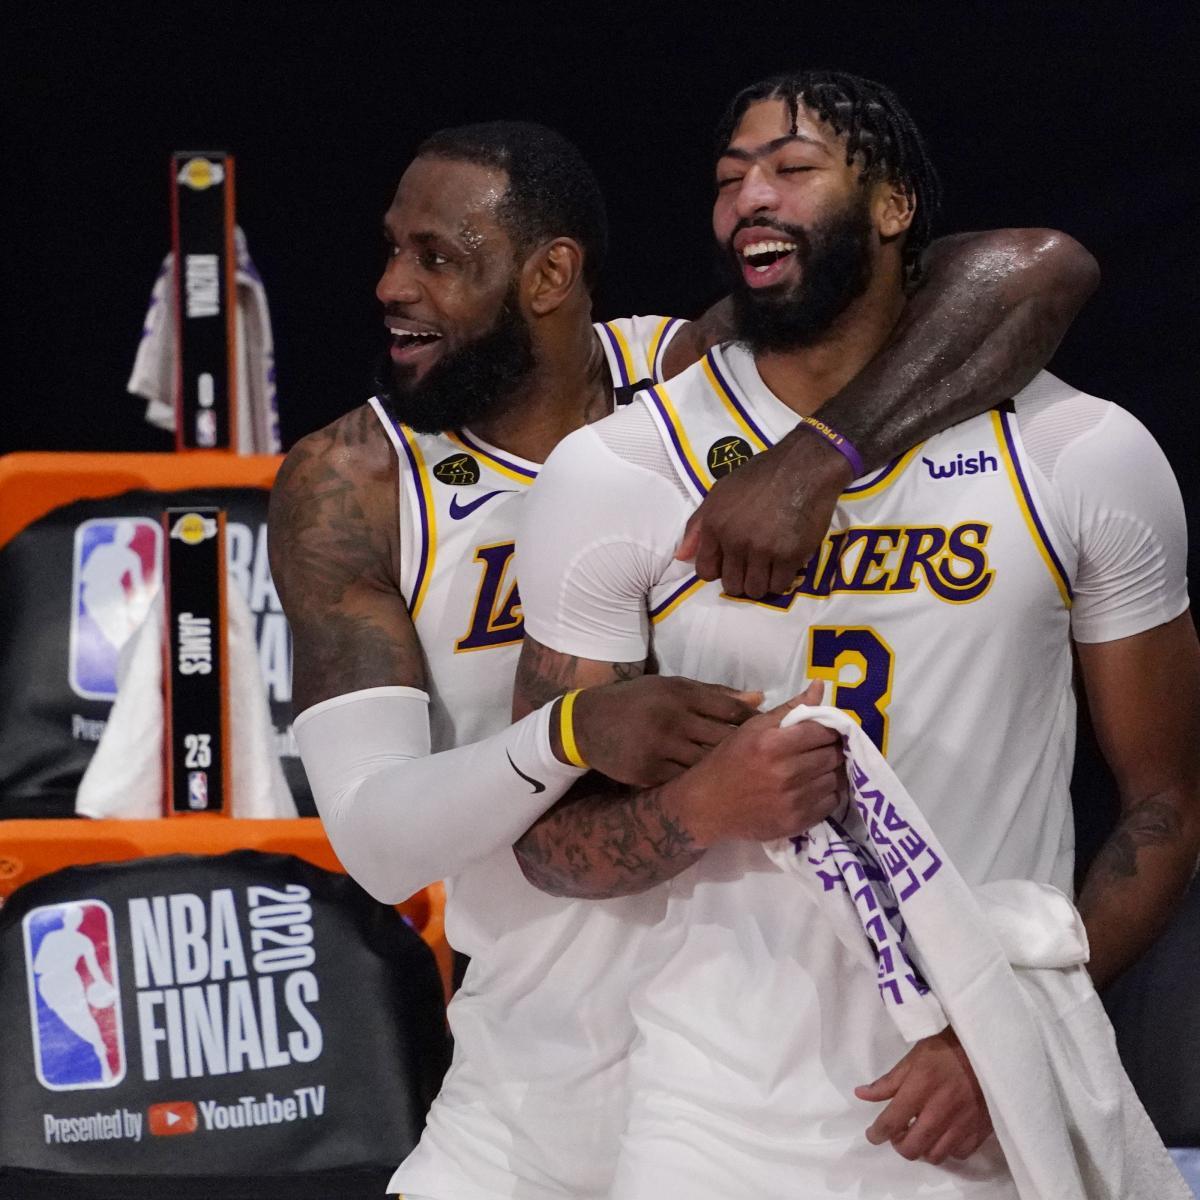 NBA Finals 2020: Lakers vs. Heat Game 6 Box Score, Top ...